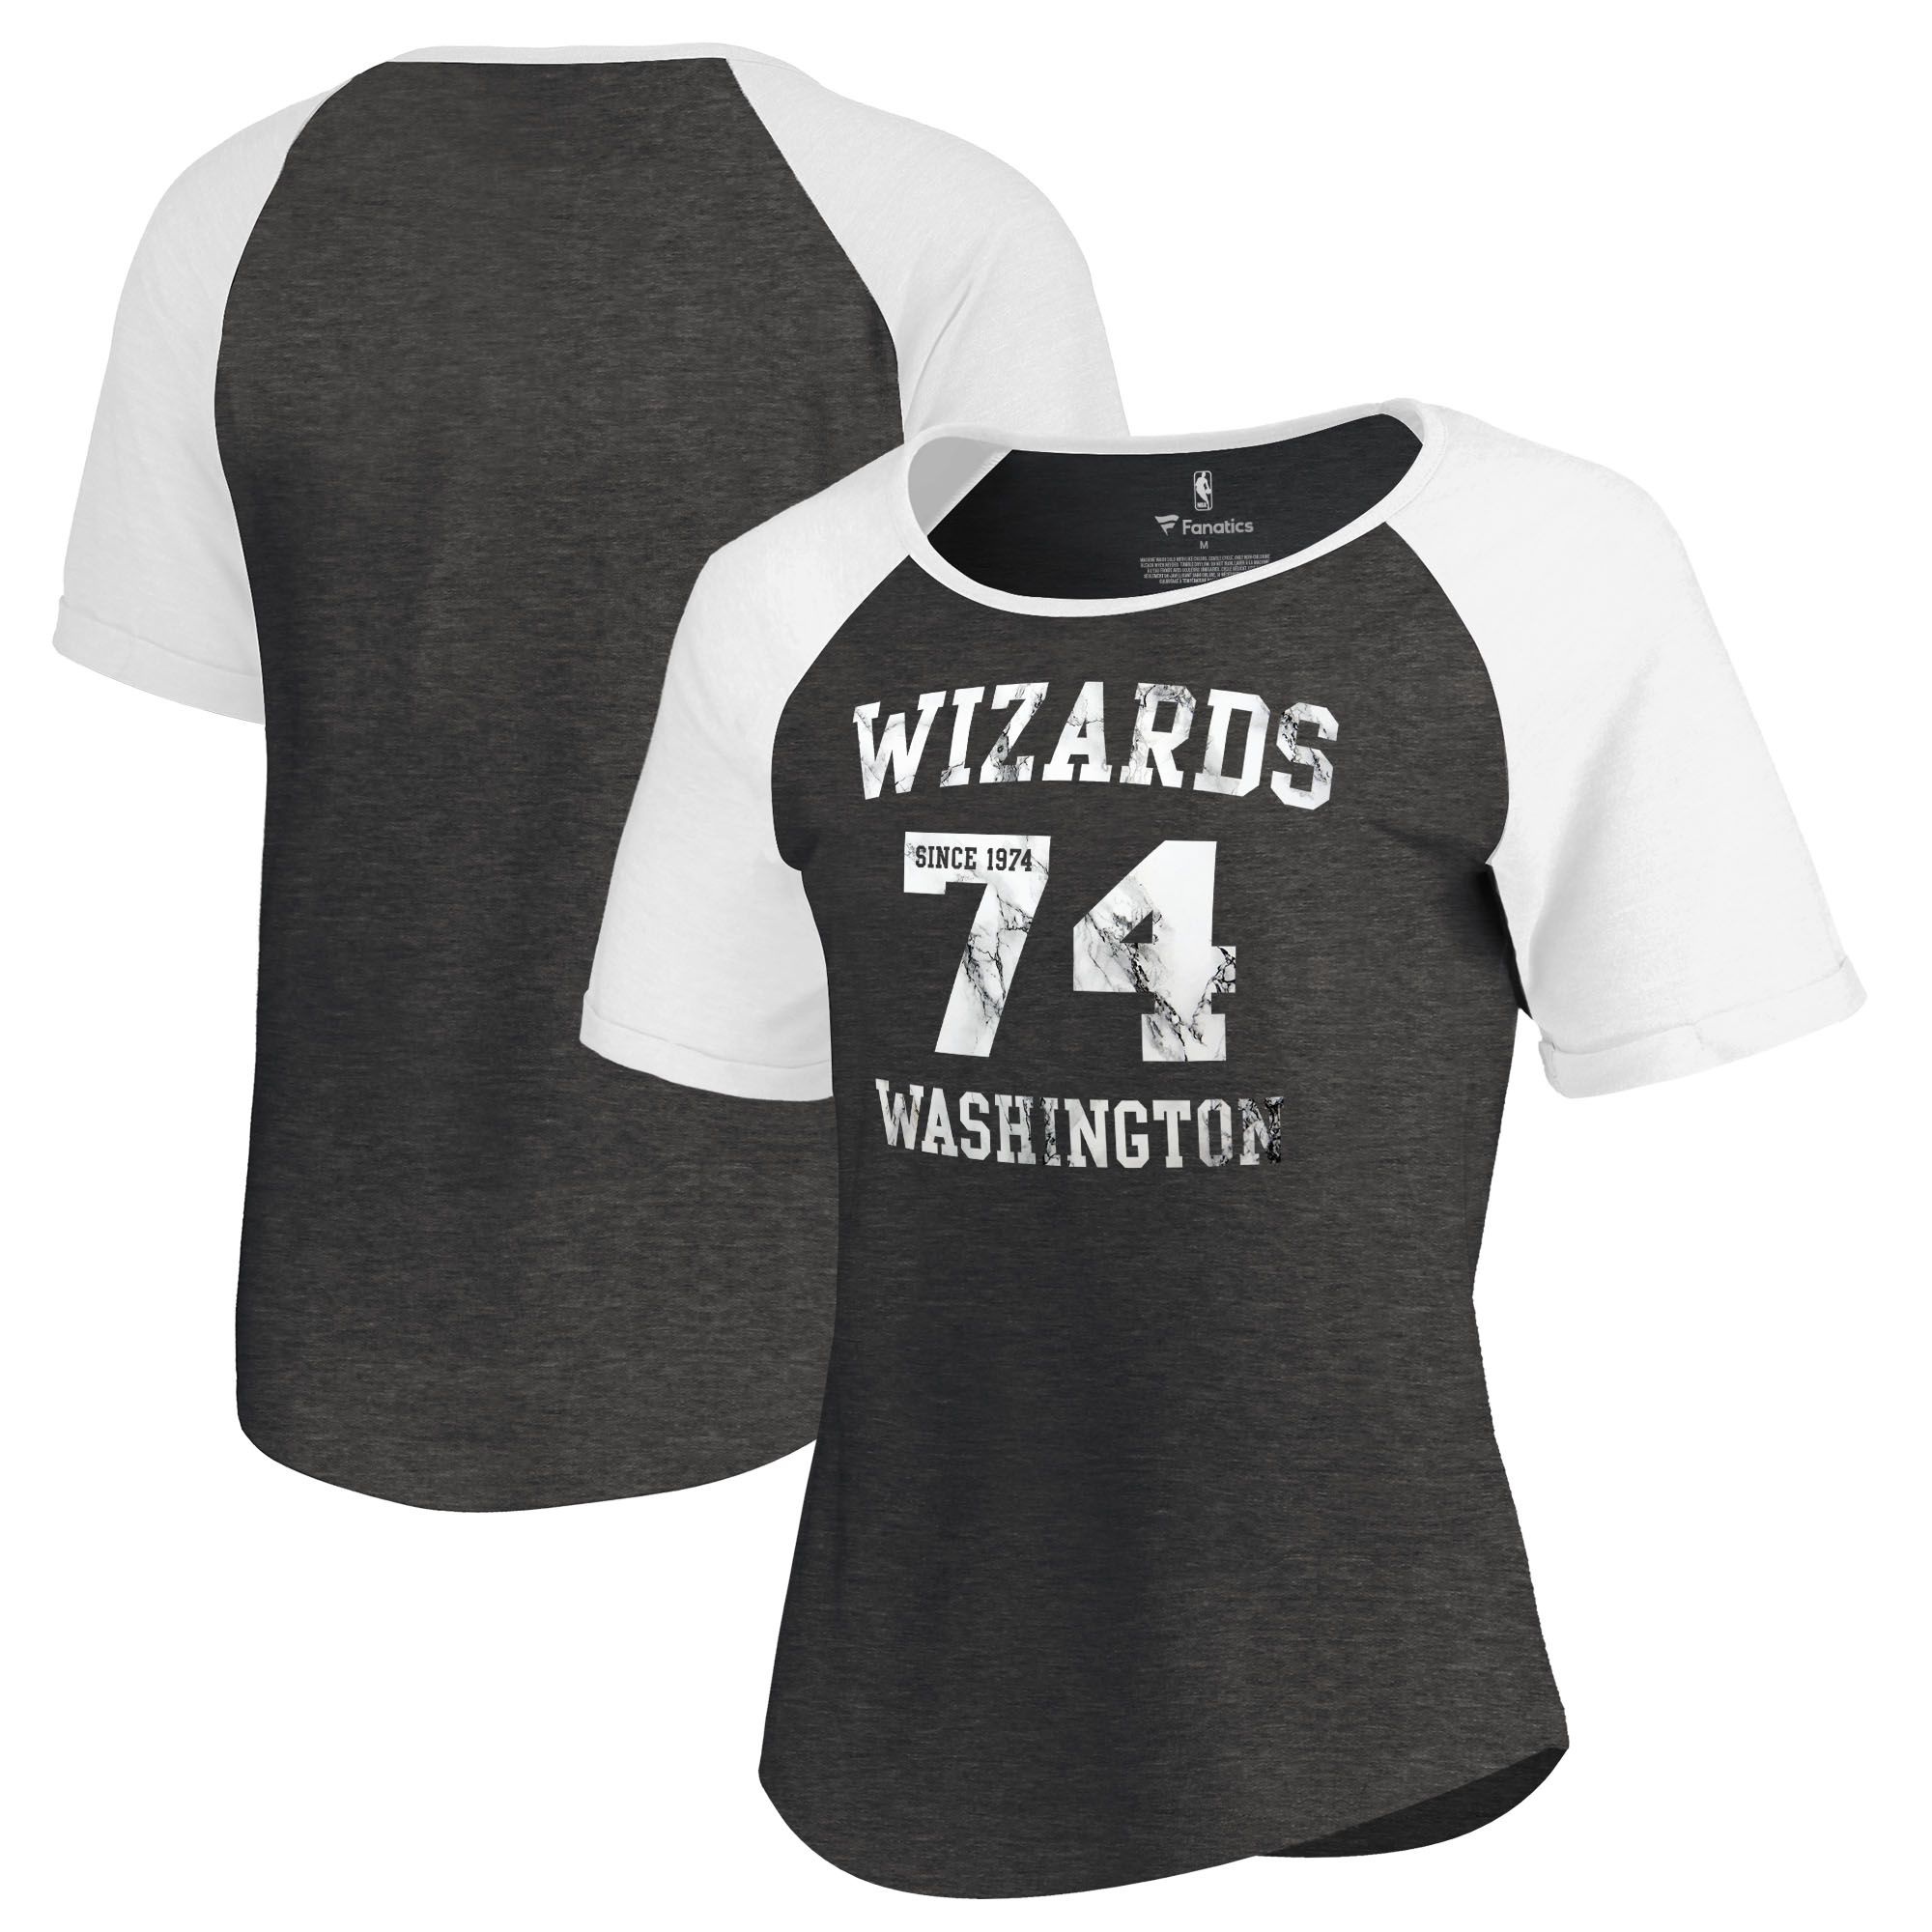 Washington Wizards Fanatics Branded Women's Hang Time Short Sleeve Raglan T-Shirt - Black